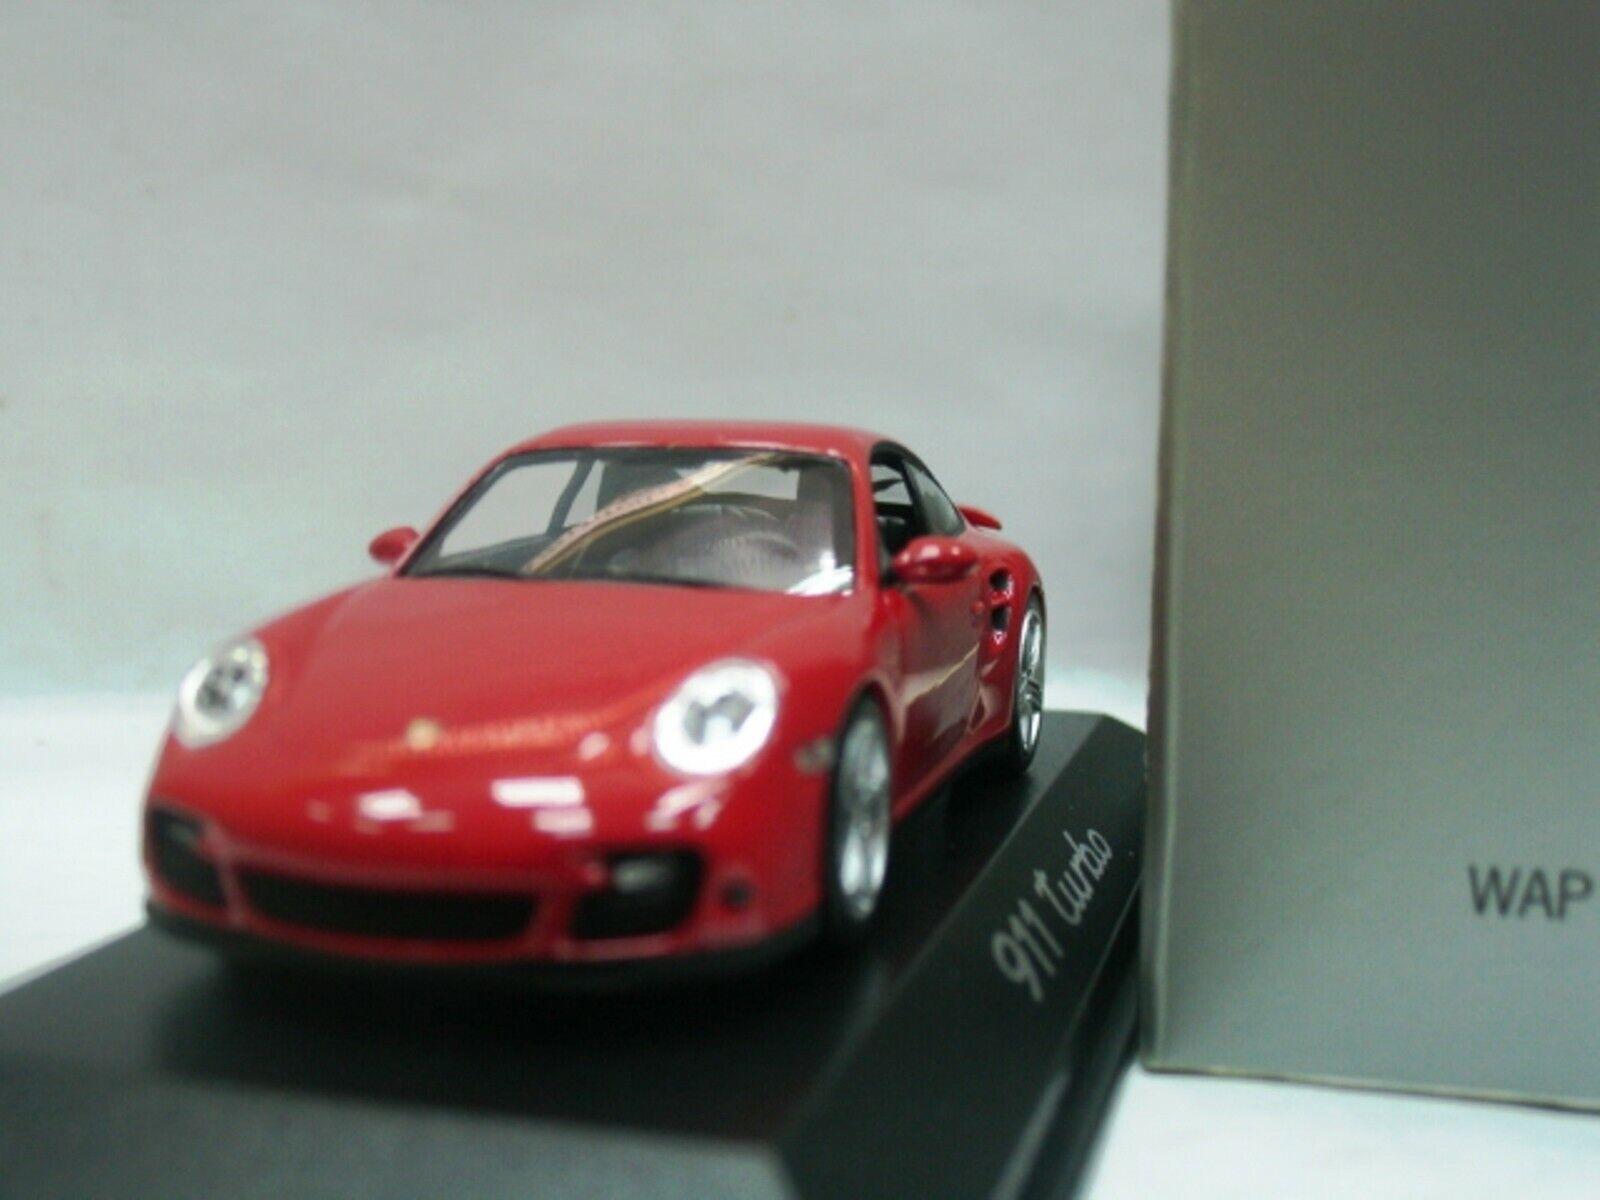 WOW EXTREMELY RARE Porsche 997 911 2006 Turbo Travel Club Club Club Red 1 43 Minichamps-RS 2f45b9